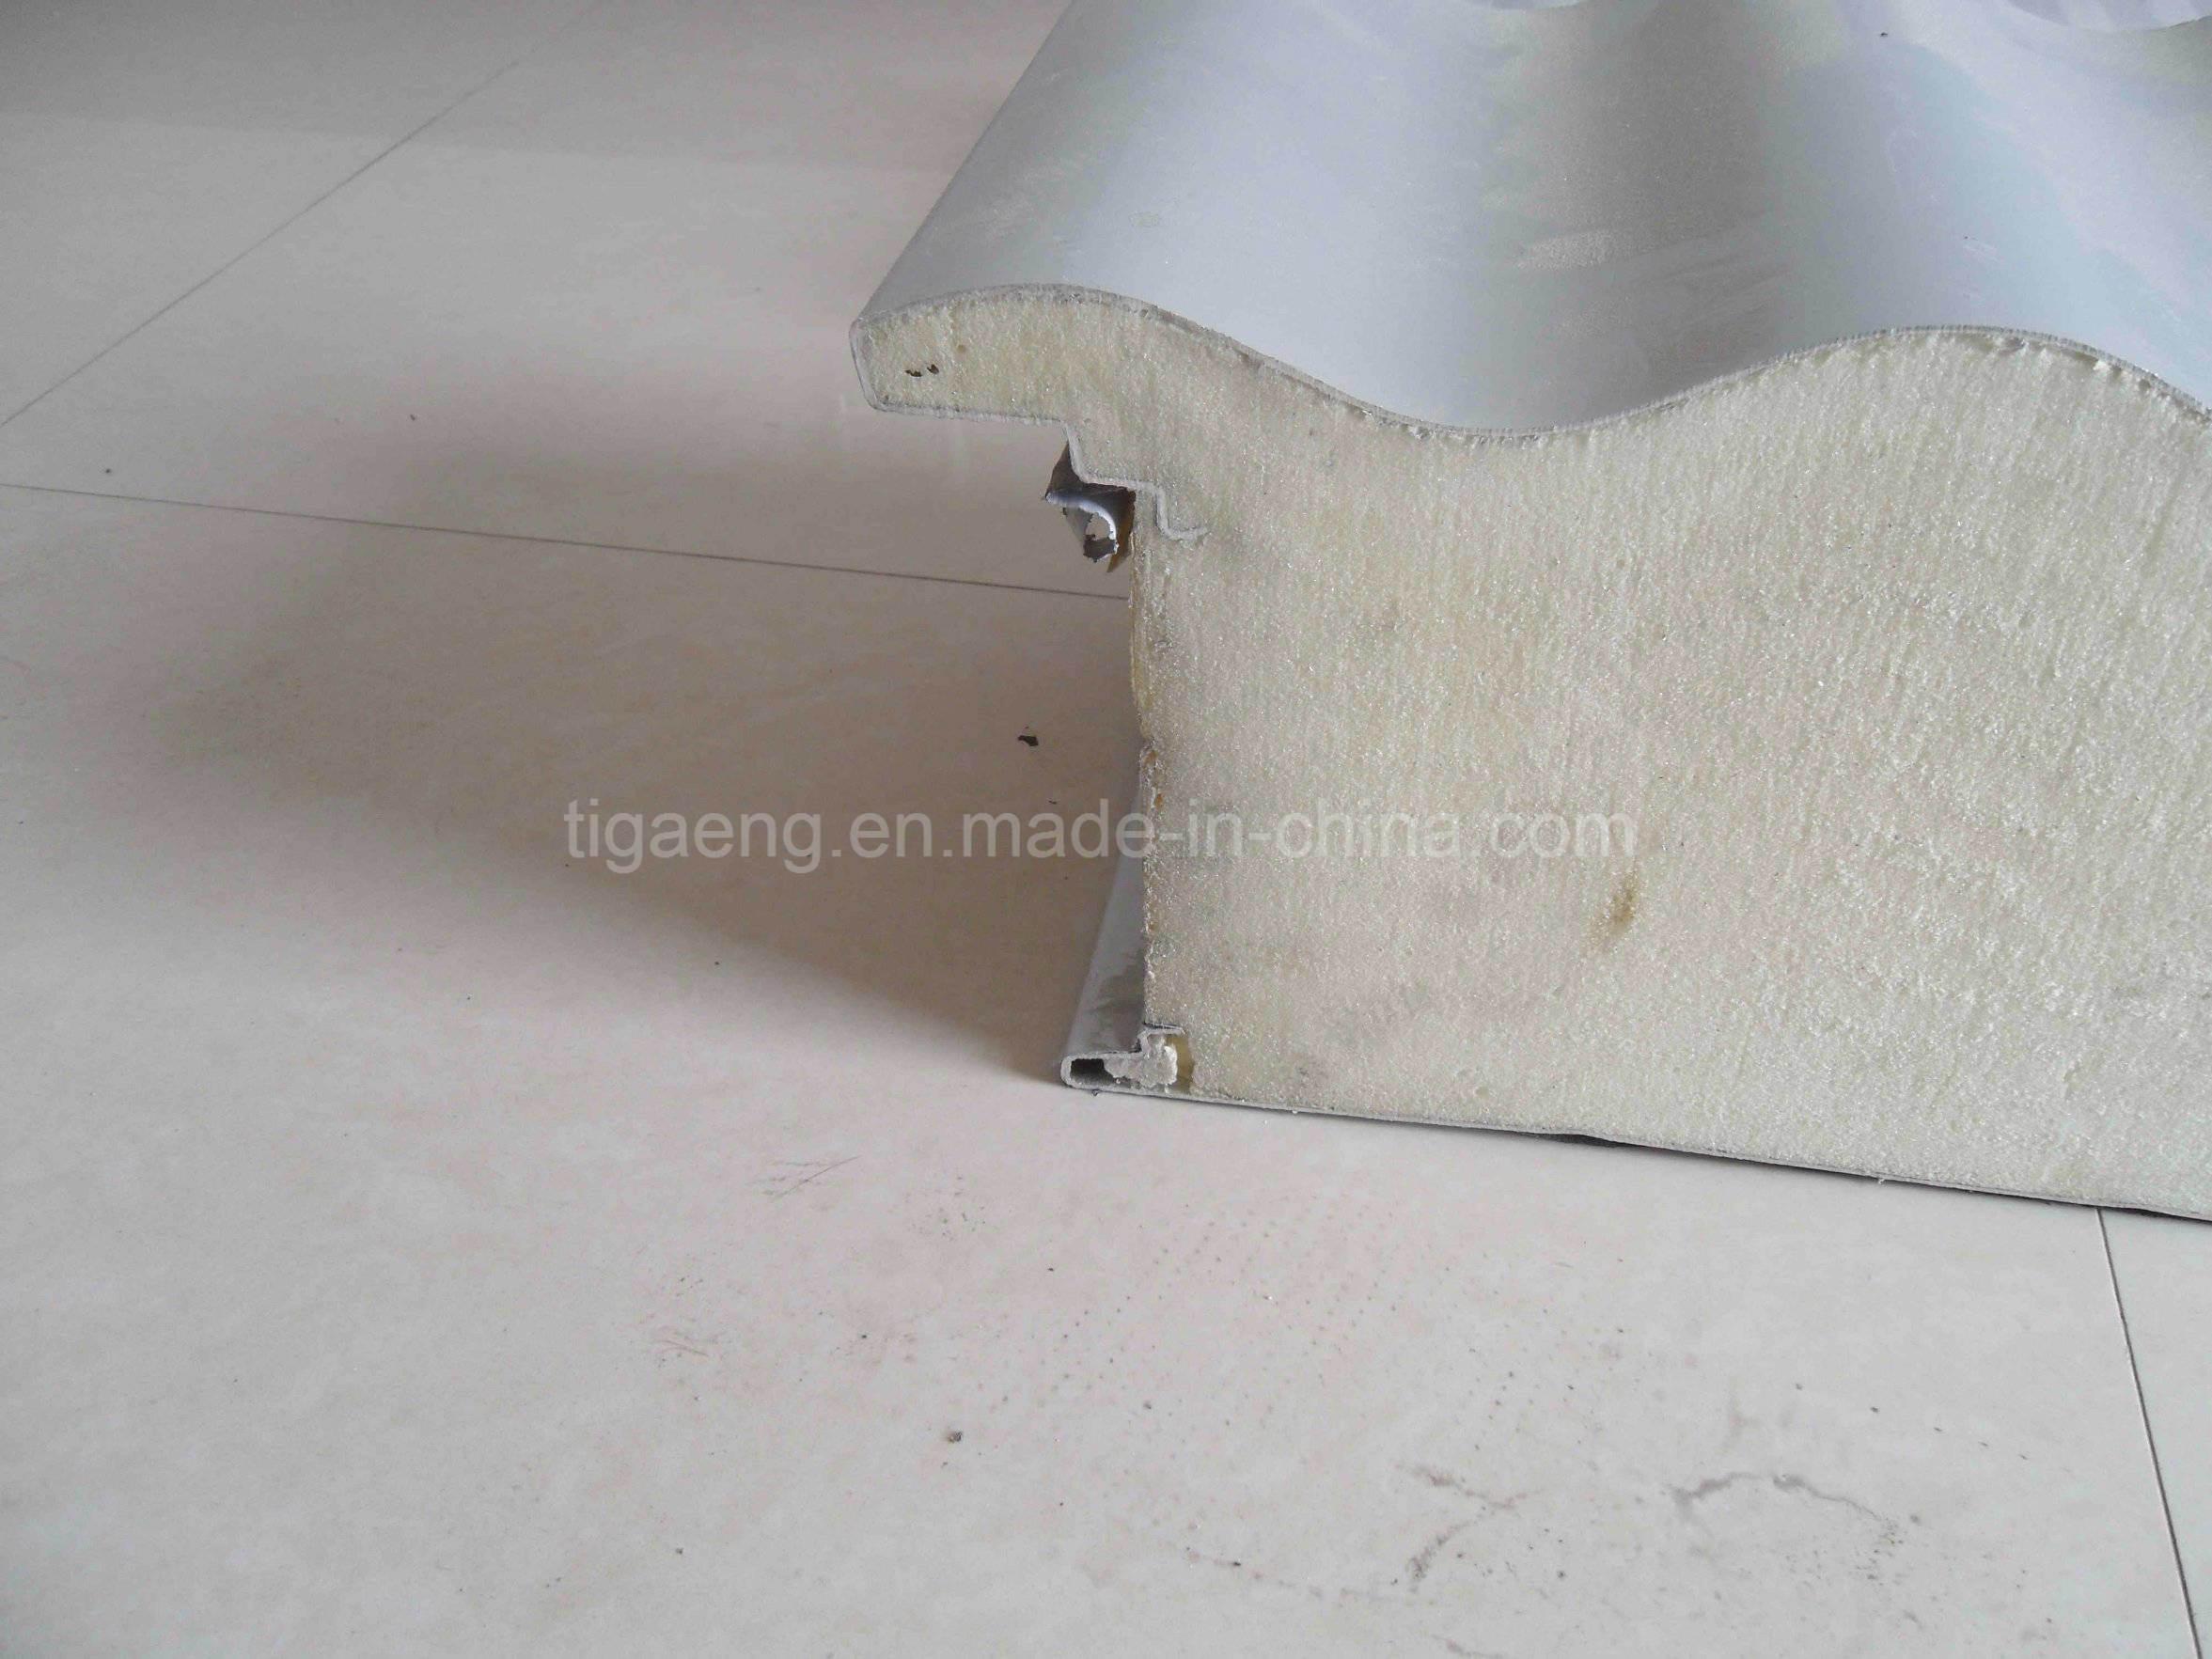 Metal Panel Material Polystyrene/PU Sandwich Panel/Roof Panel